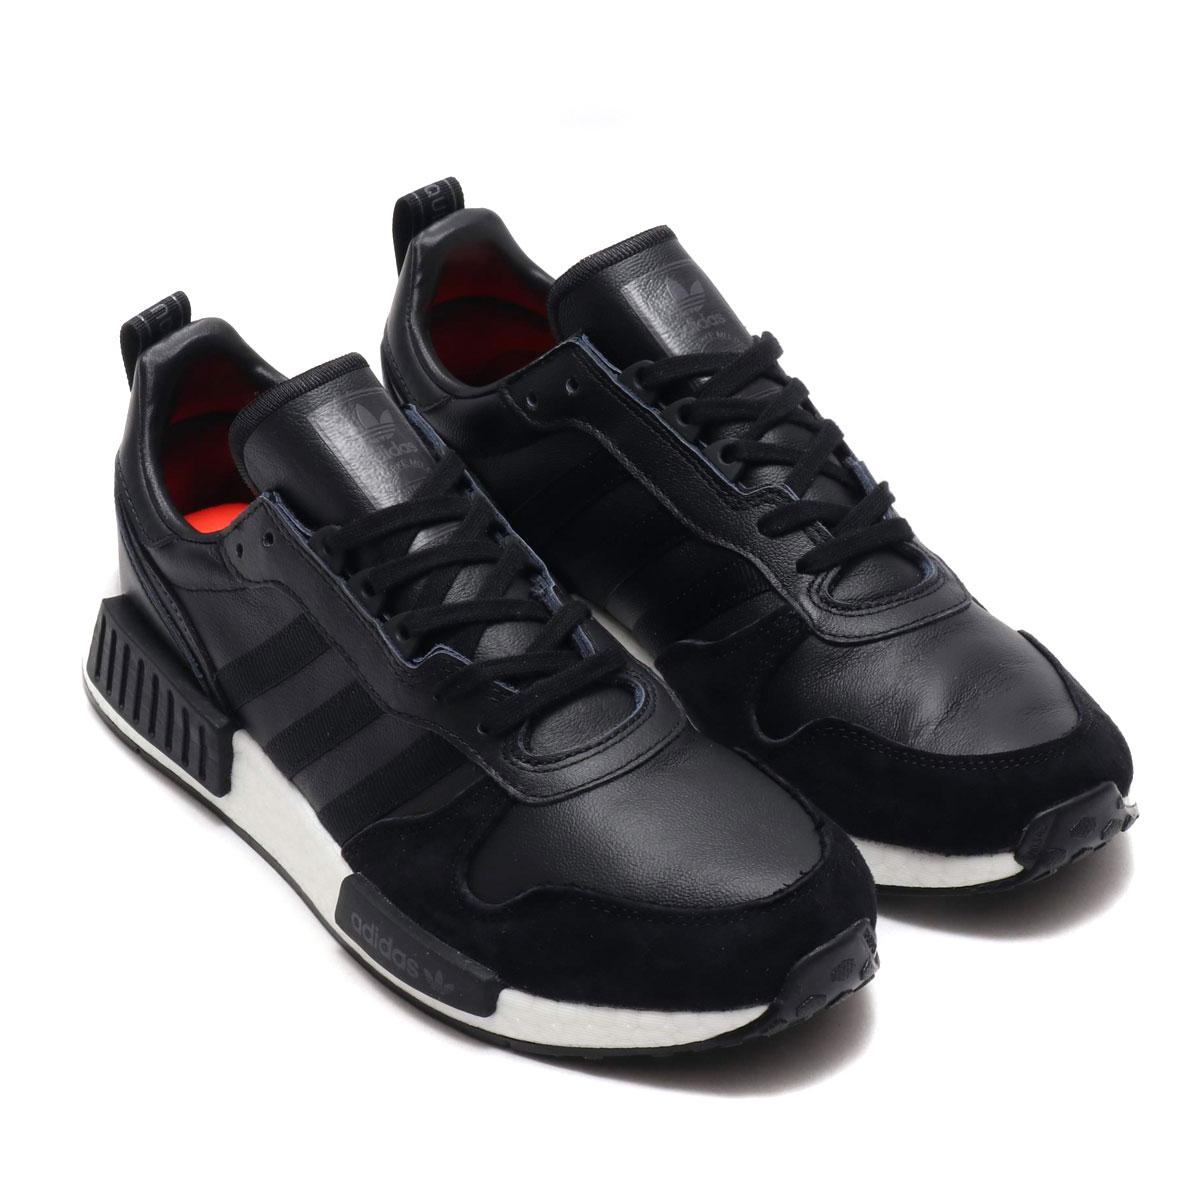 adidas RISINGSTAR x R1(アディダス ライジングスター x R1) BLACK【メンズ スニーカー】19SS-S